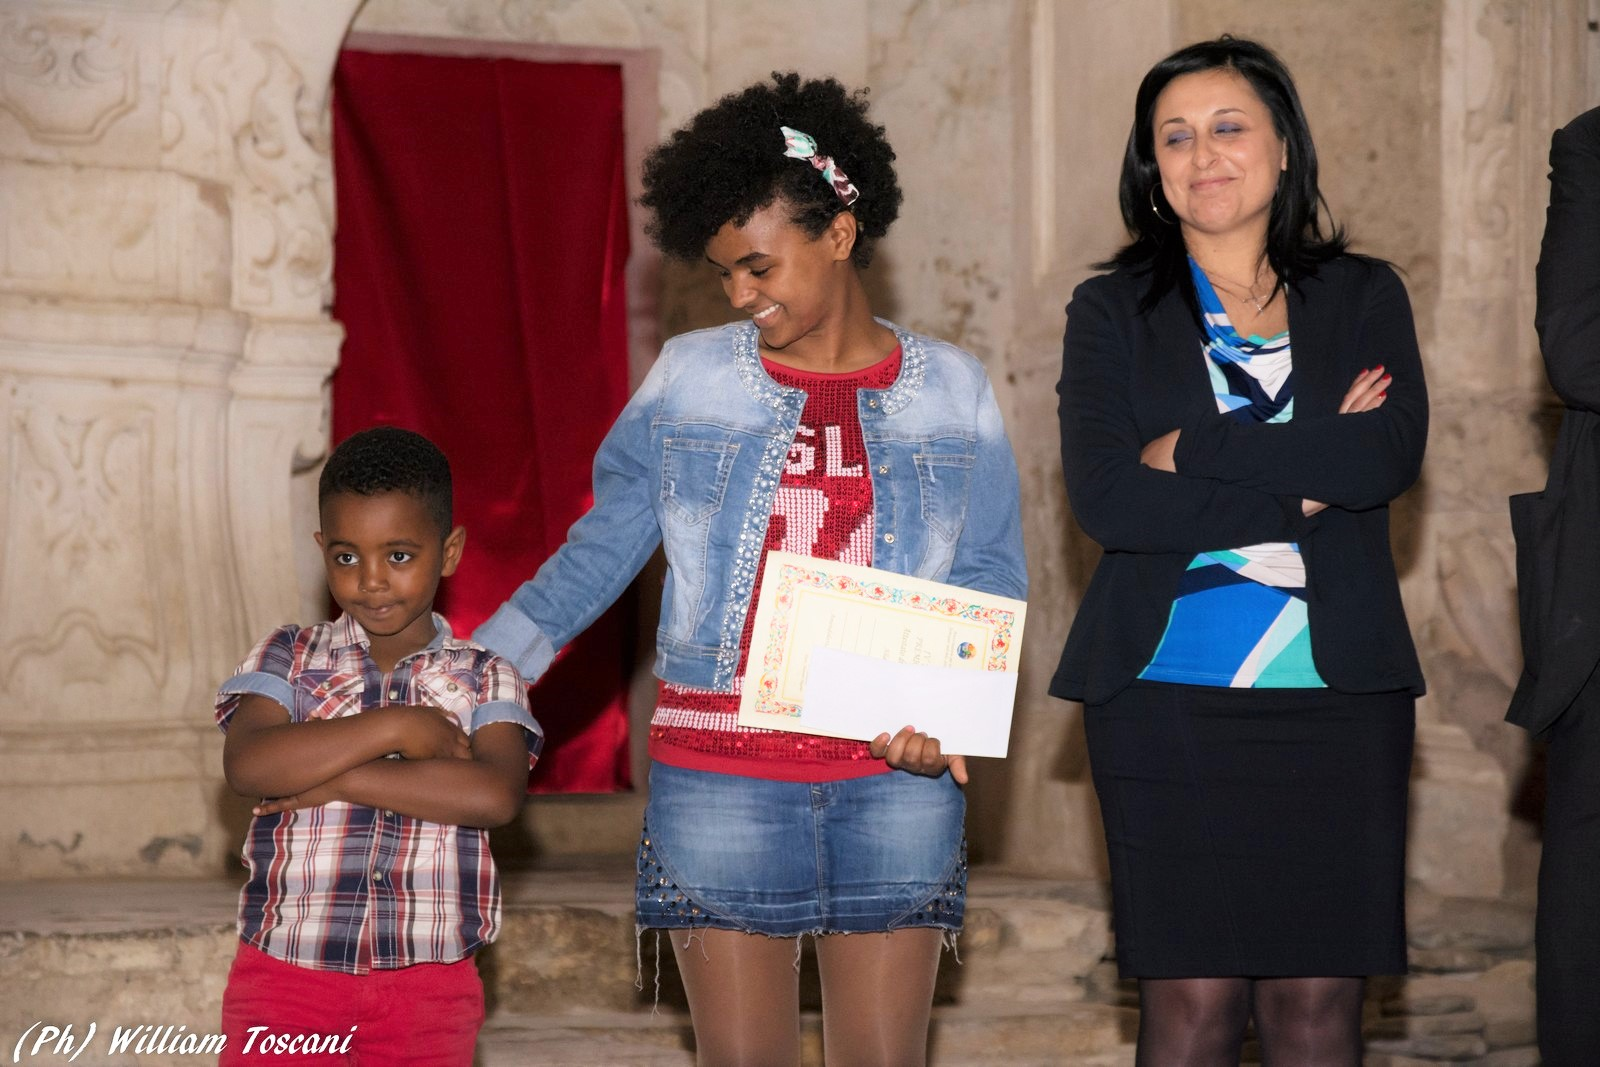 Premio_pagano_041